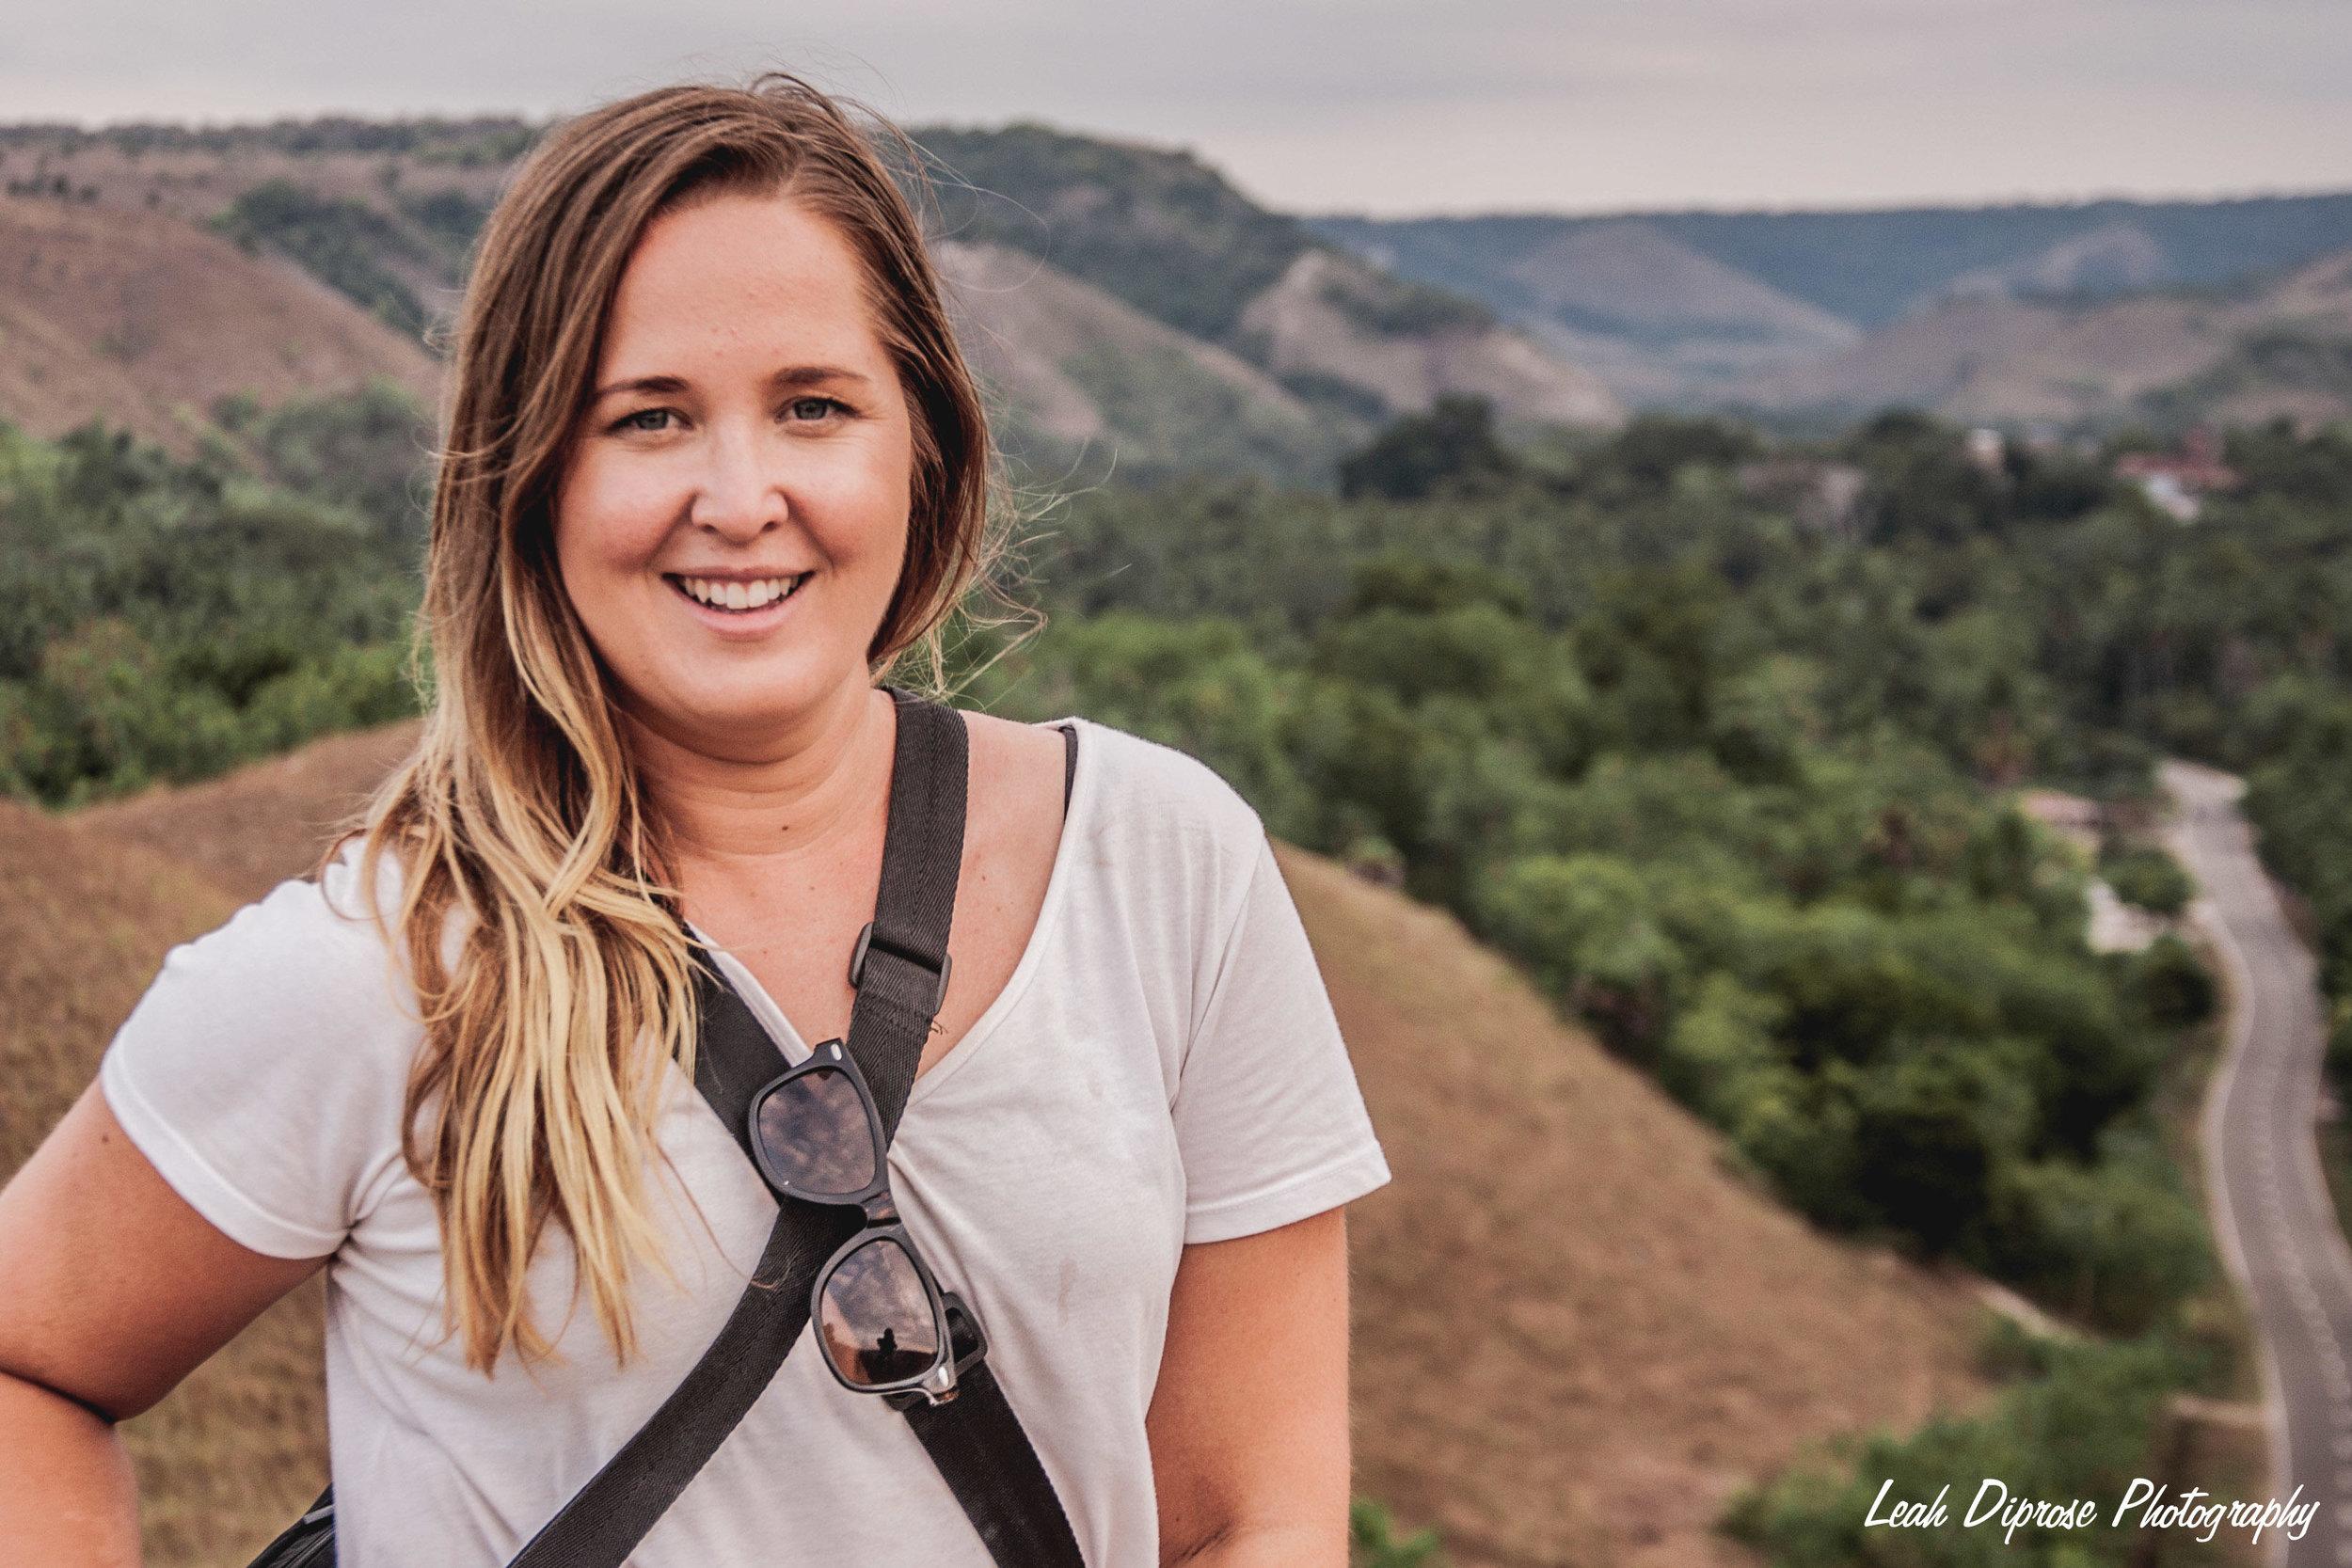 Leah Diprose Photography image-5269.jpg